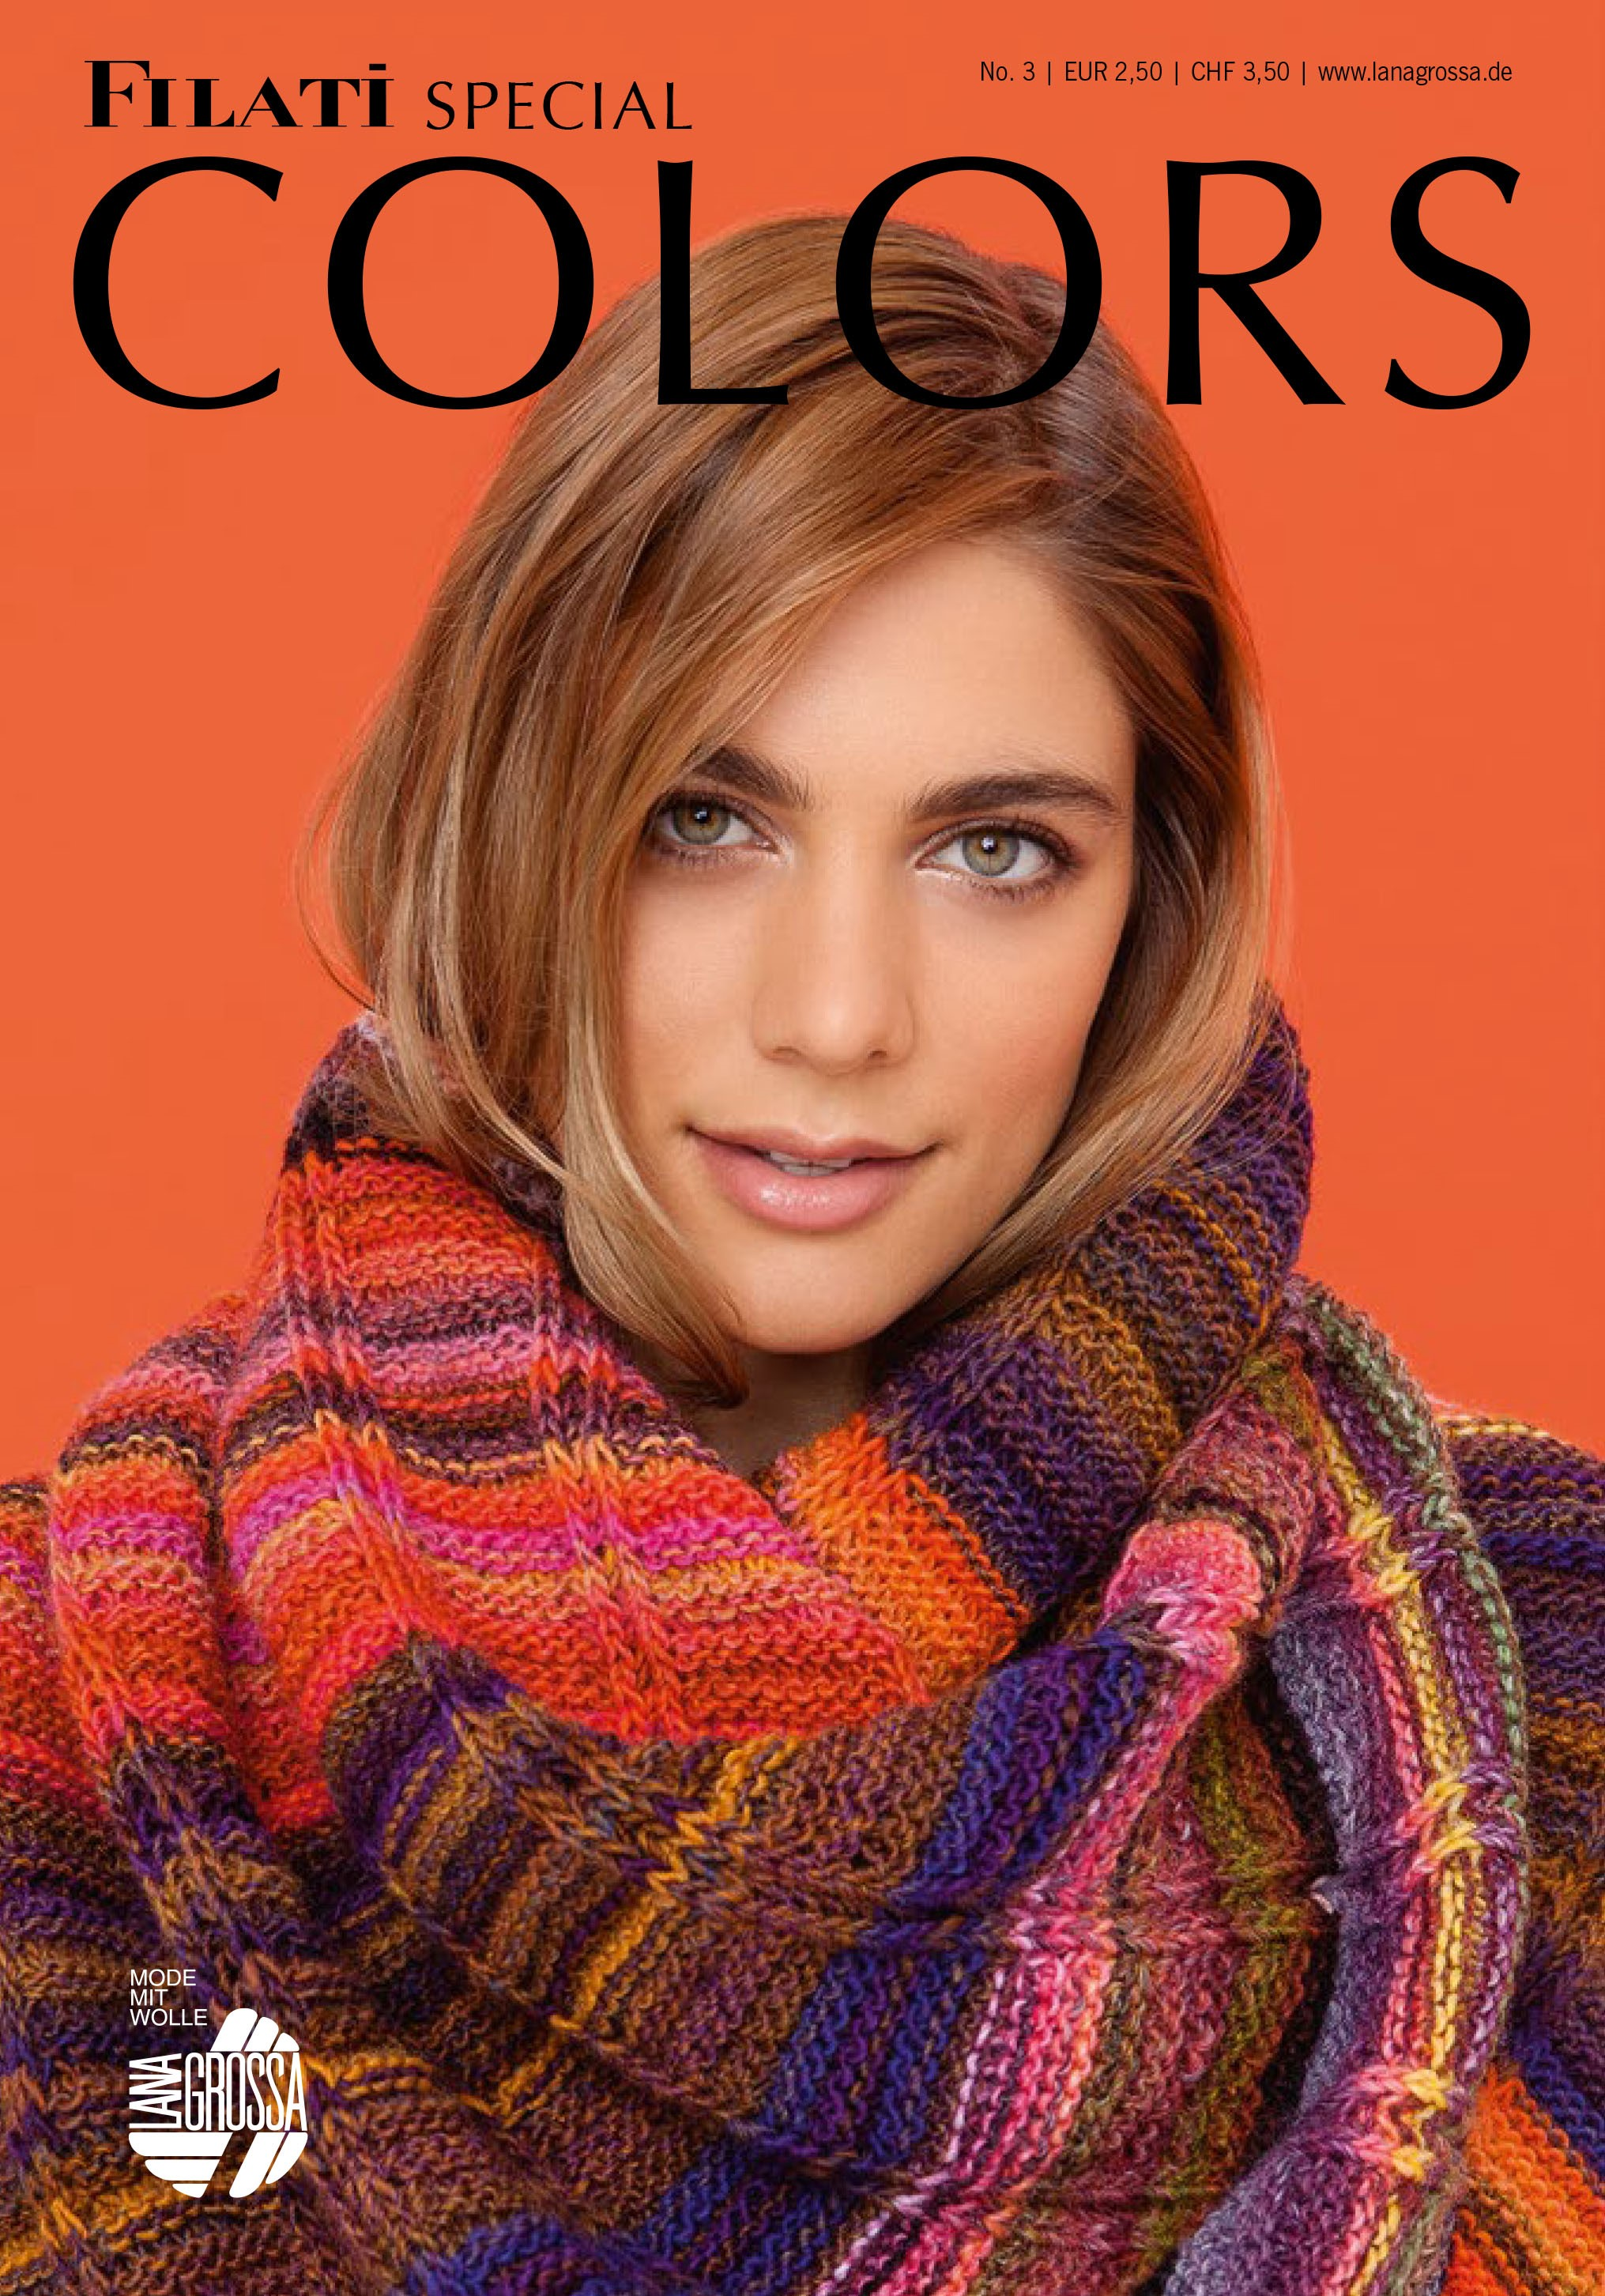 Lana Grossa COLORS No. 3 - German Edition